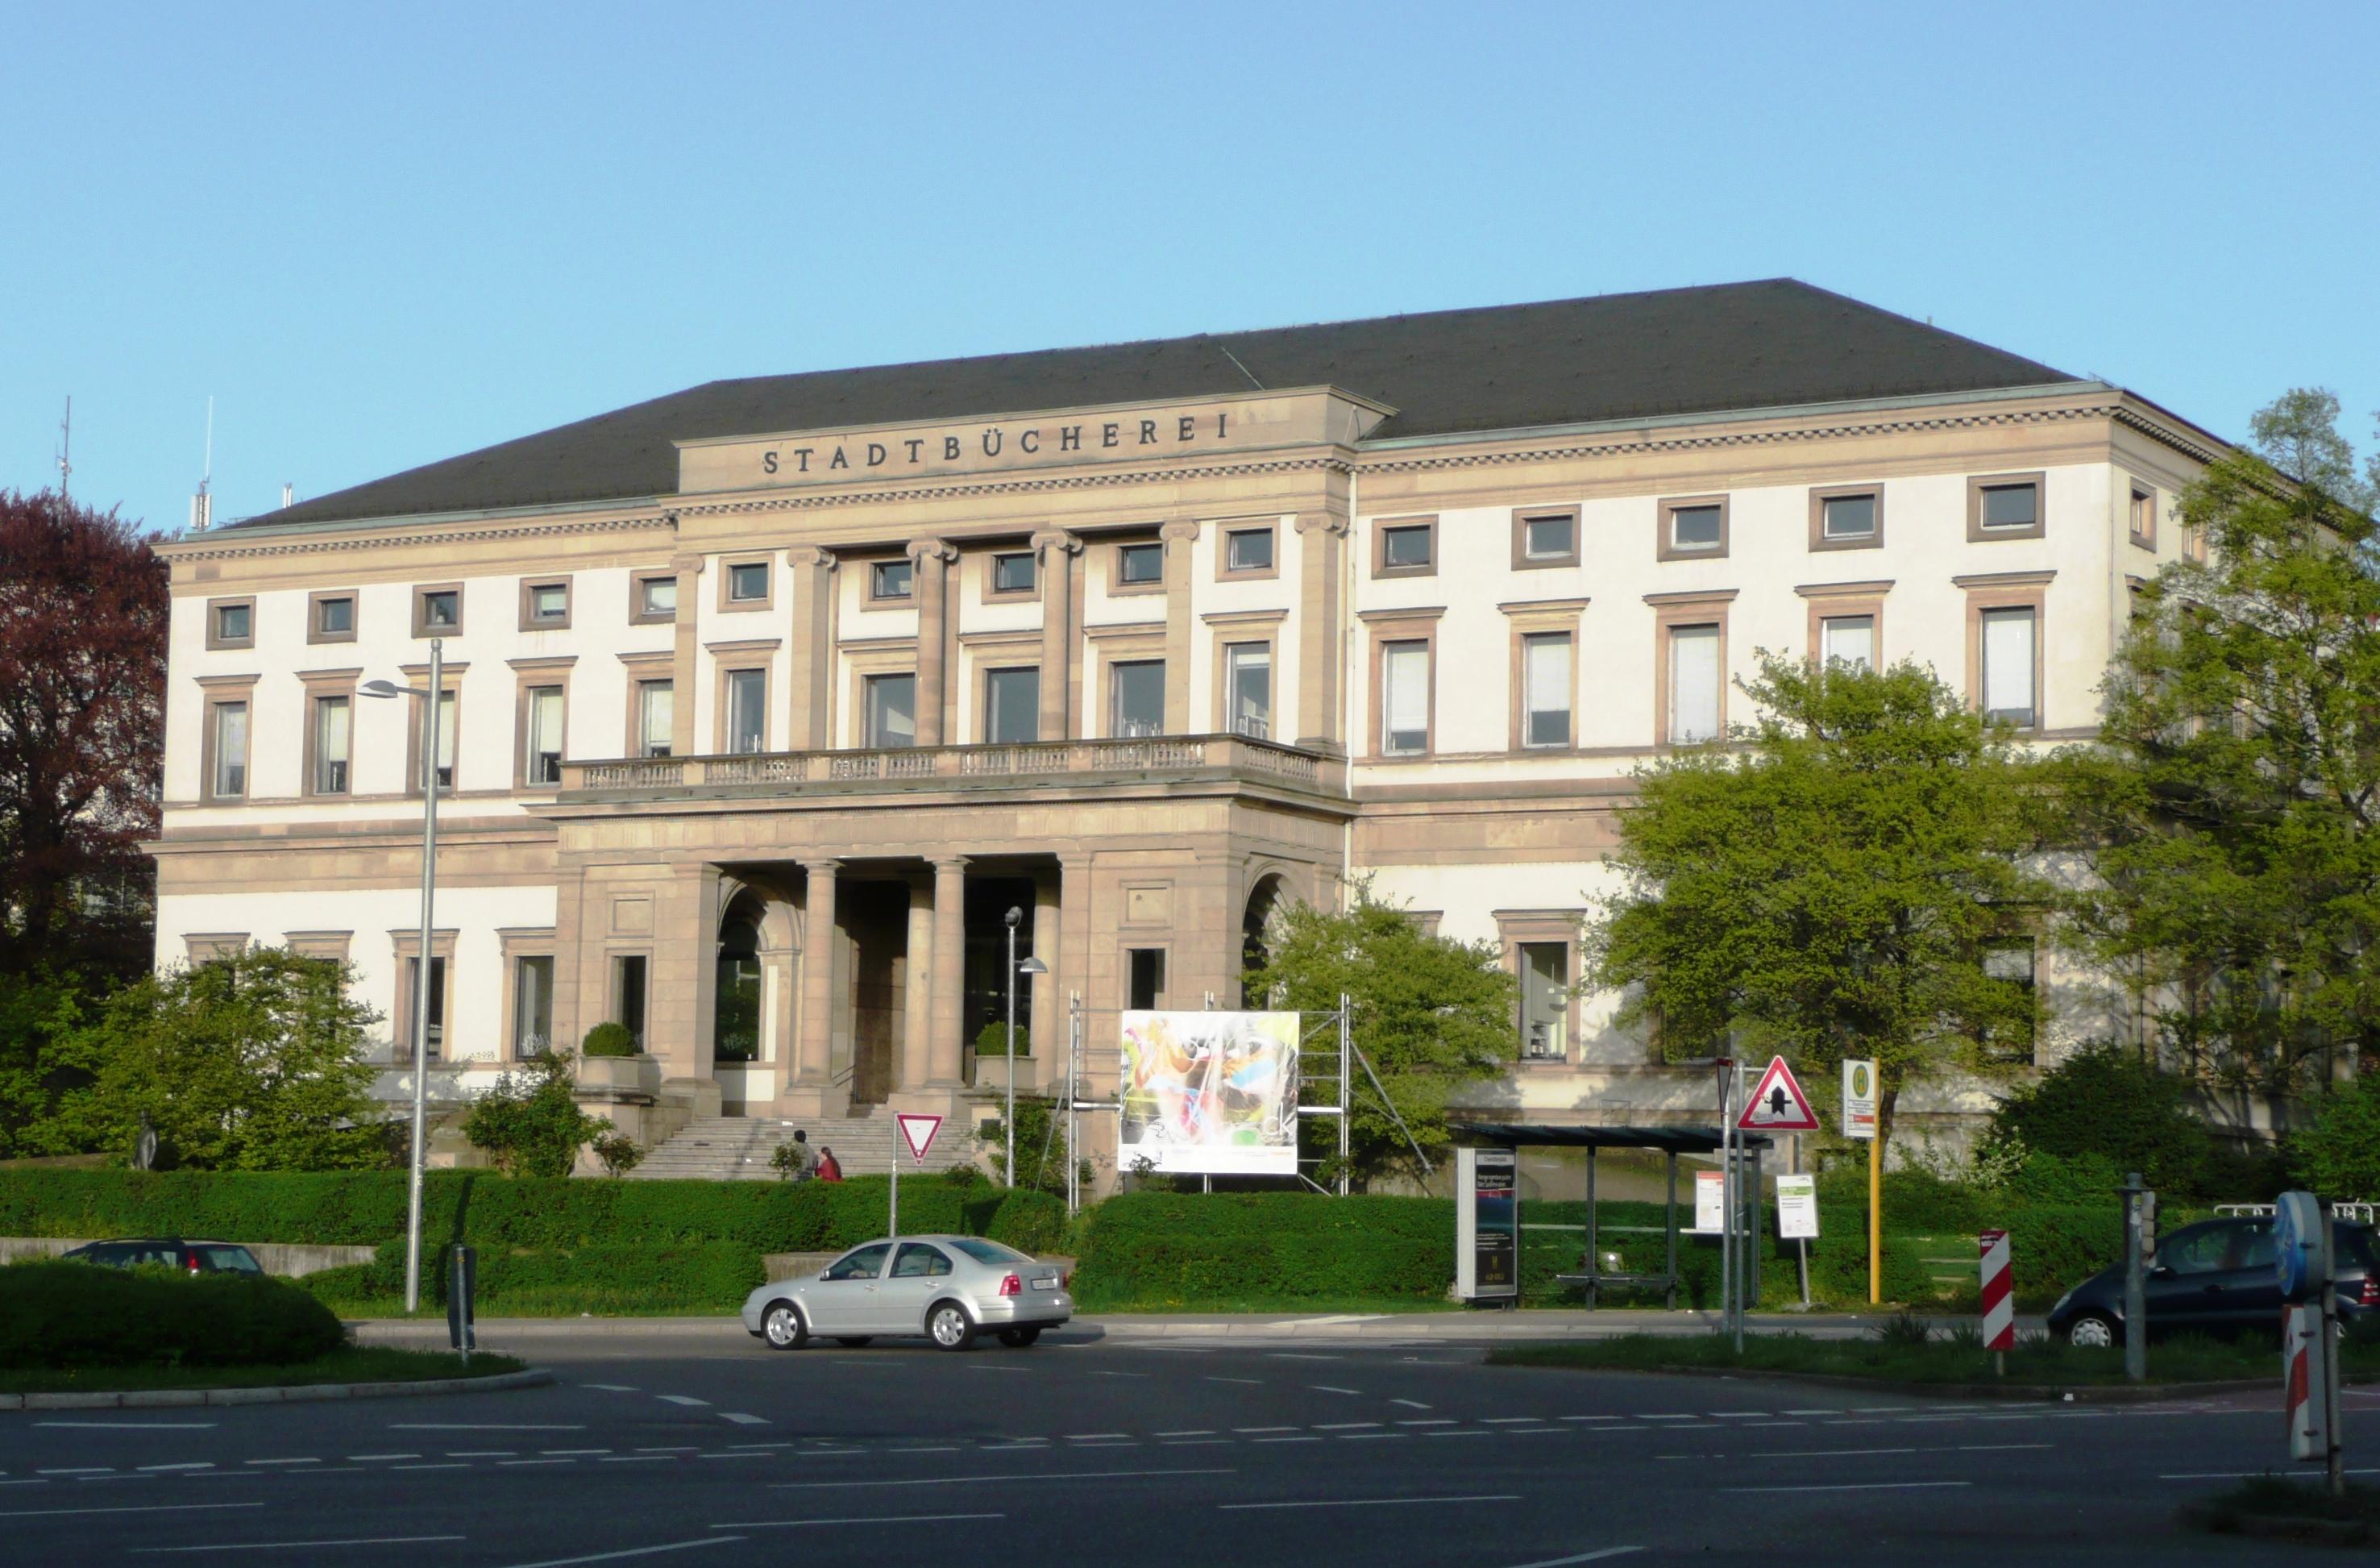 Stadtbibliothek stuttgart wikiwand for Who is perfect stuttgart